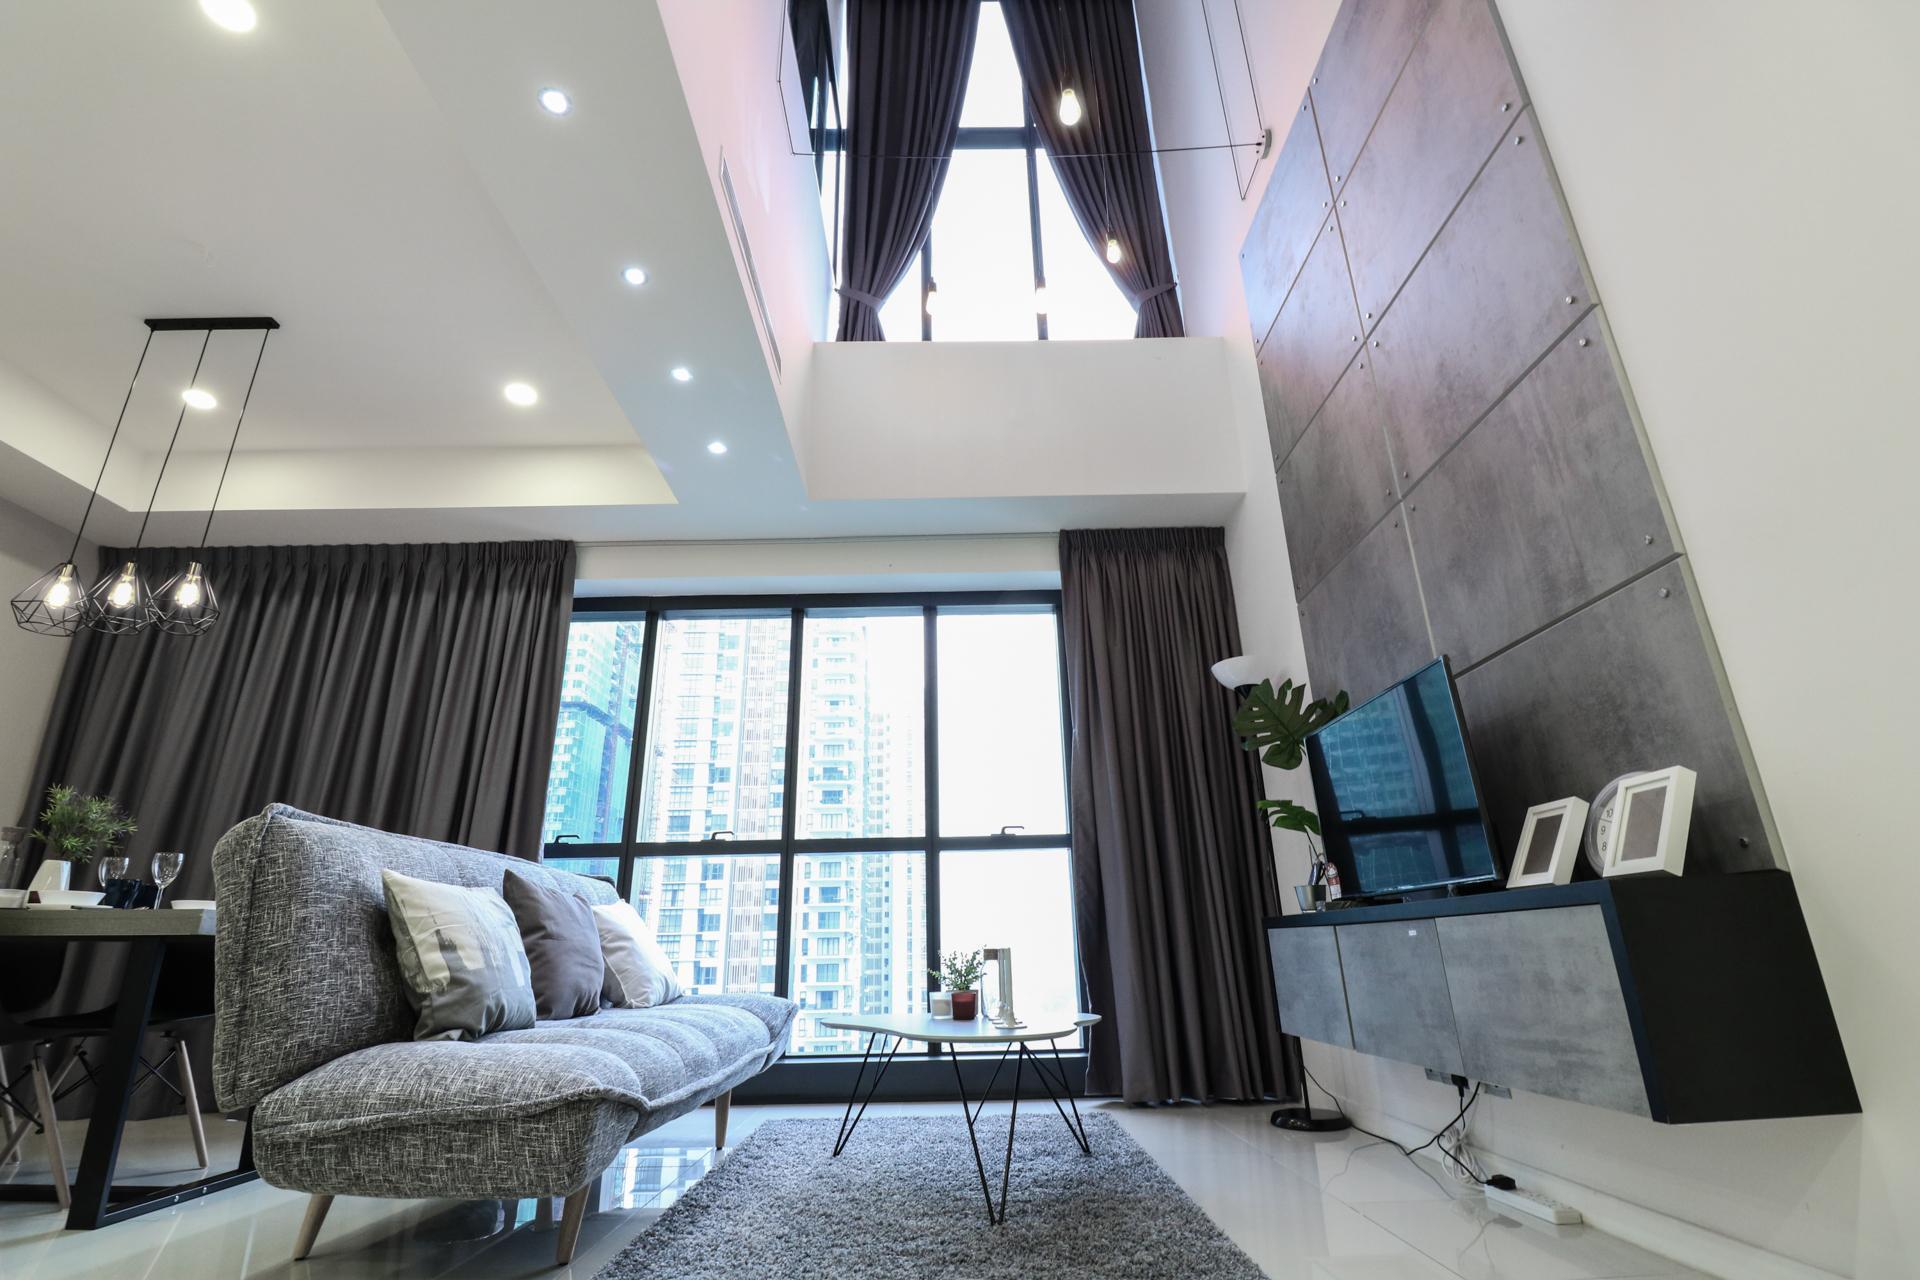 Victoria Home M City Kuala Lumpur Promo Harga Terbaik Agoda Com # Promo Meuble Tv Design Sultan